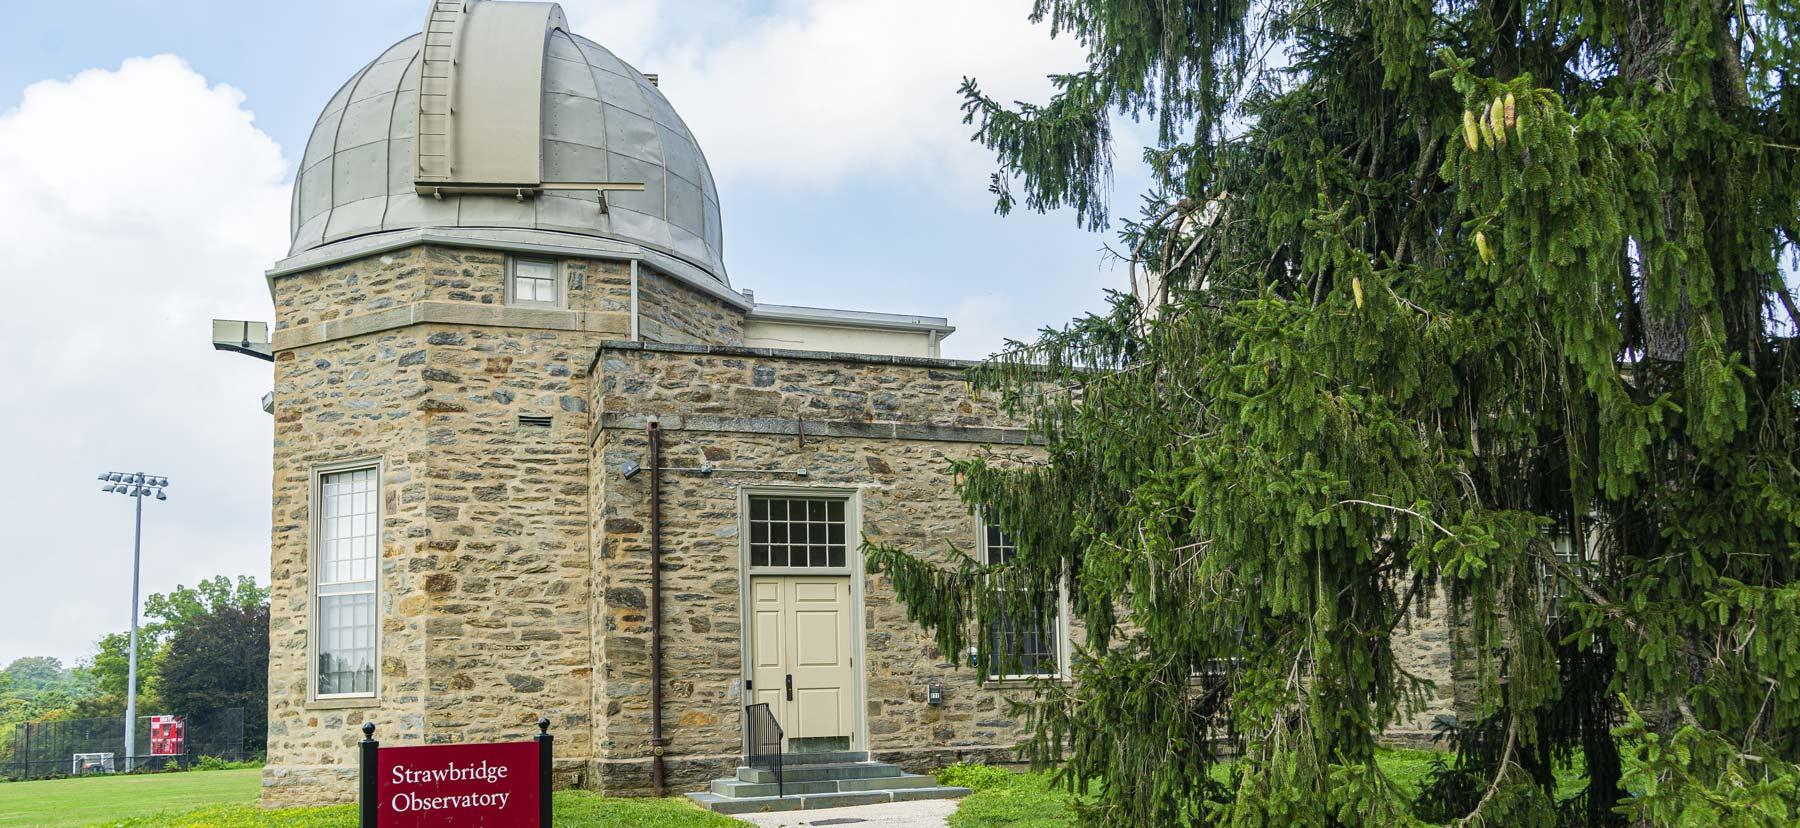 Strawbridge Observatory